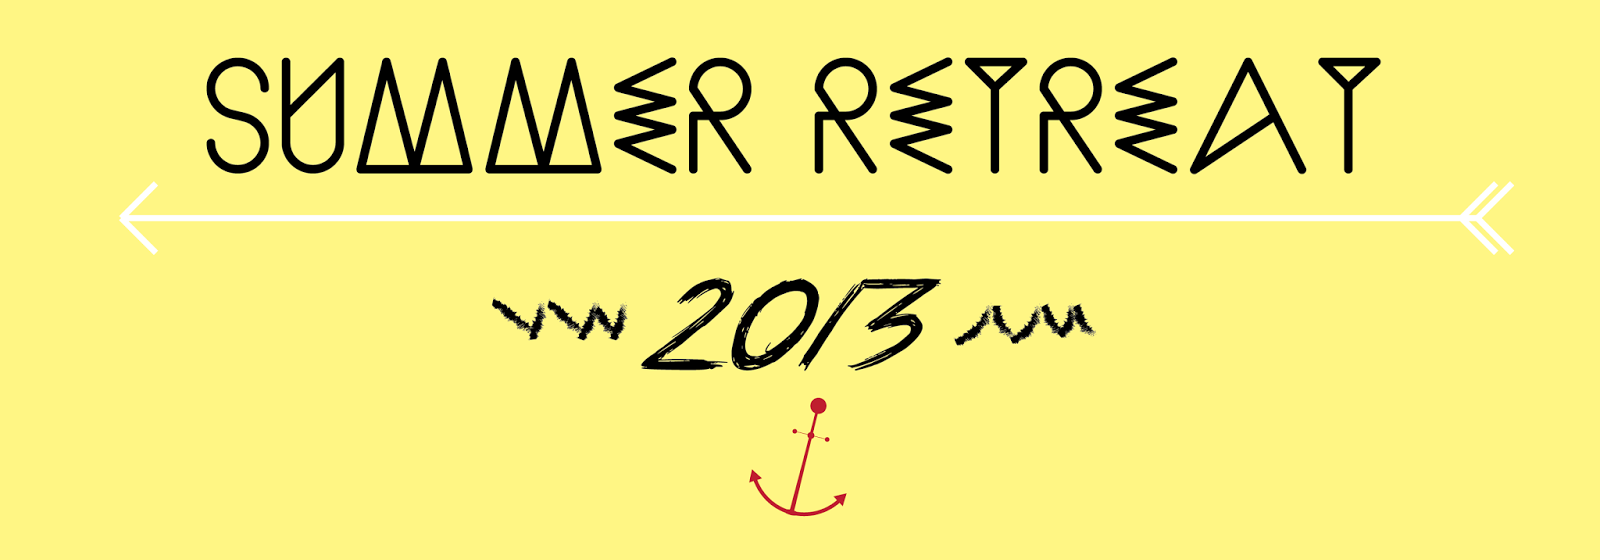 Summer-Retreat-e1375130896975